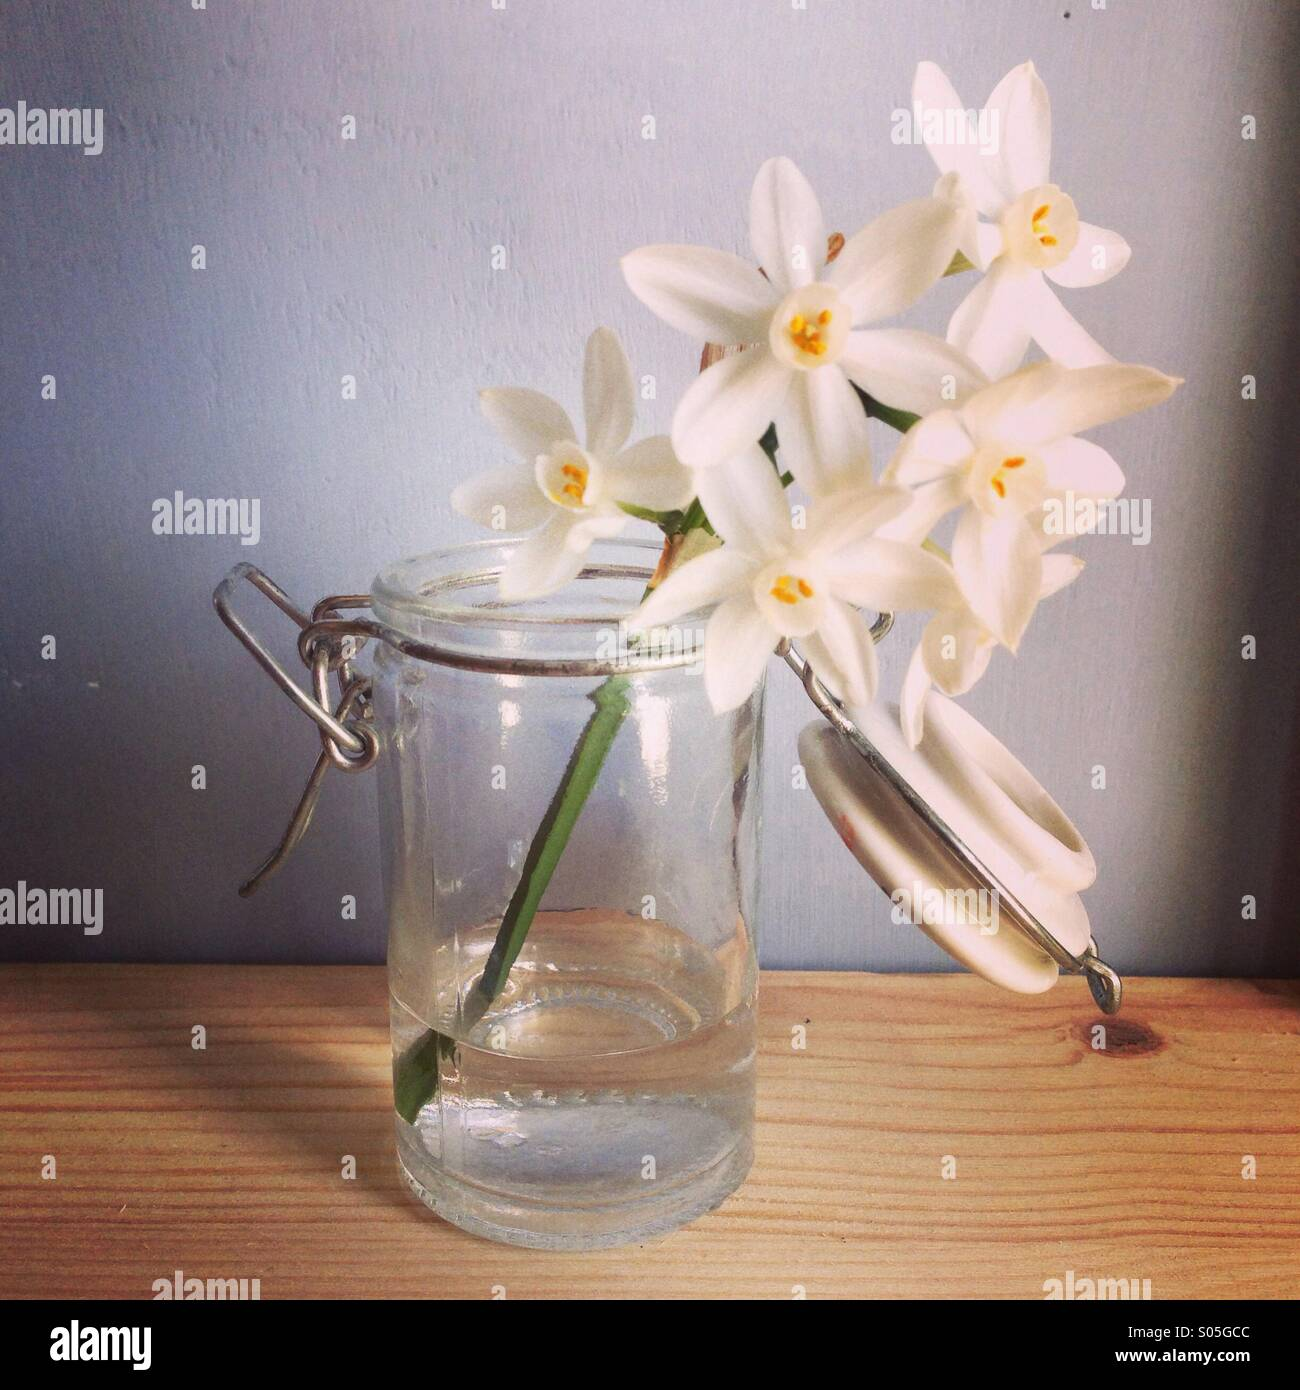 Little flower, amazing scent - Stock Image